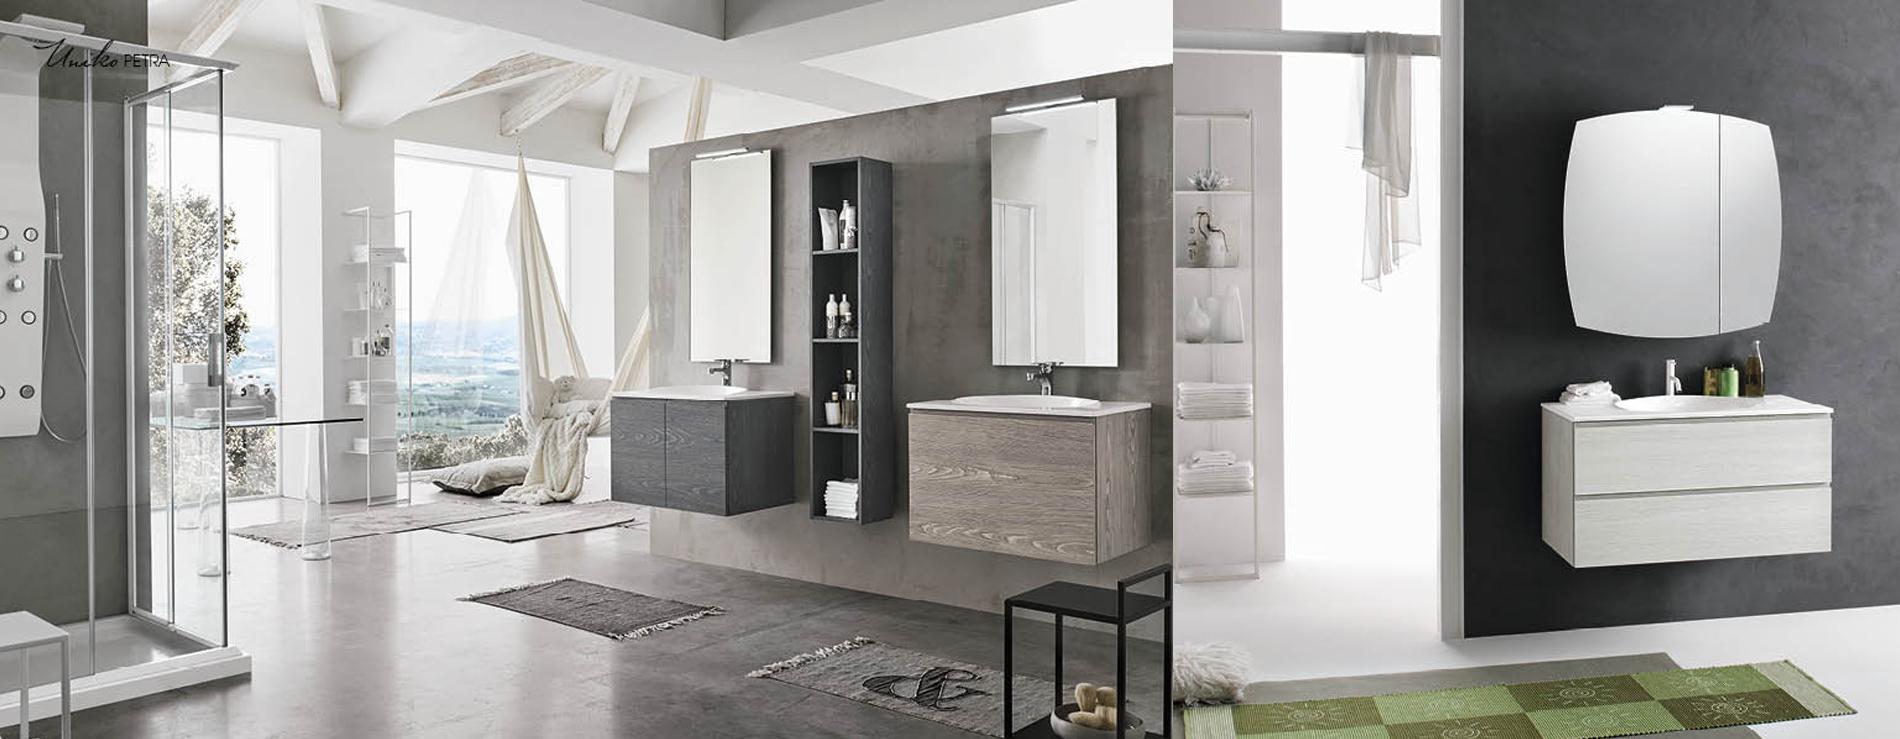 Uniko artesi centro mobili for Artesi arredo bagno